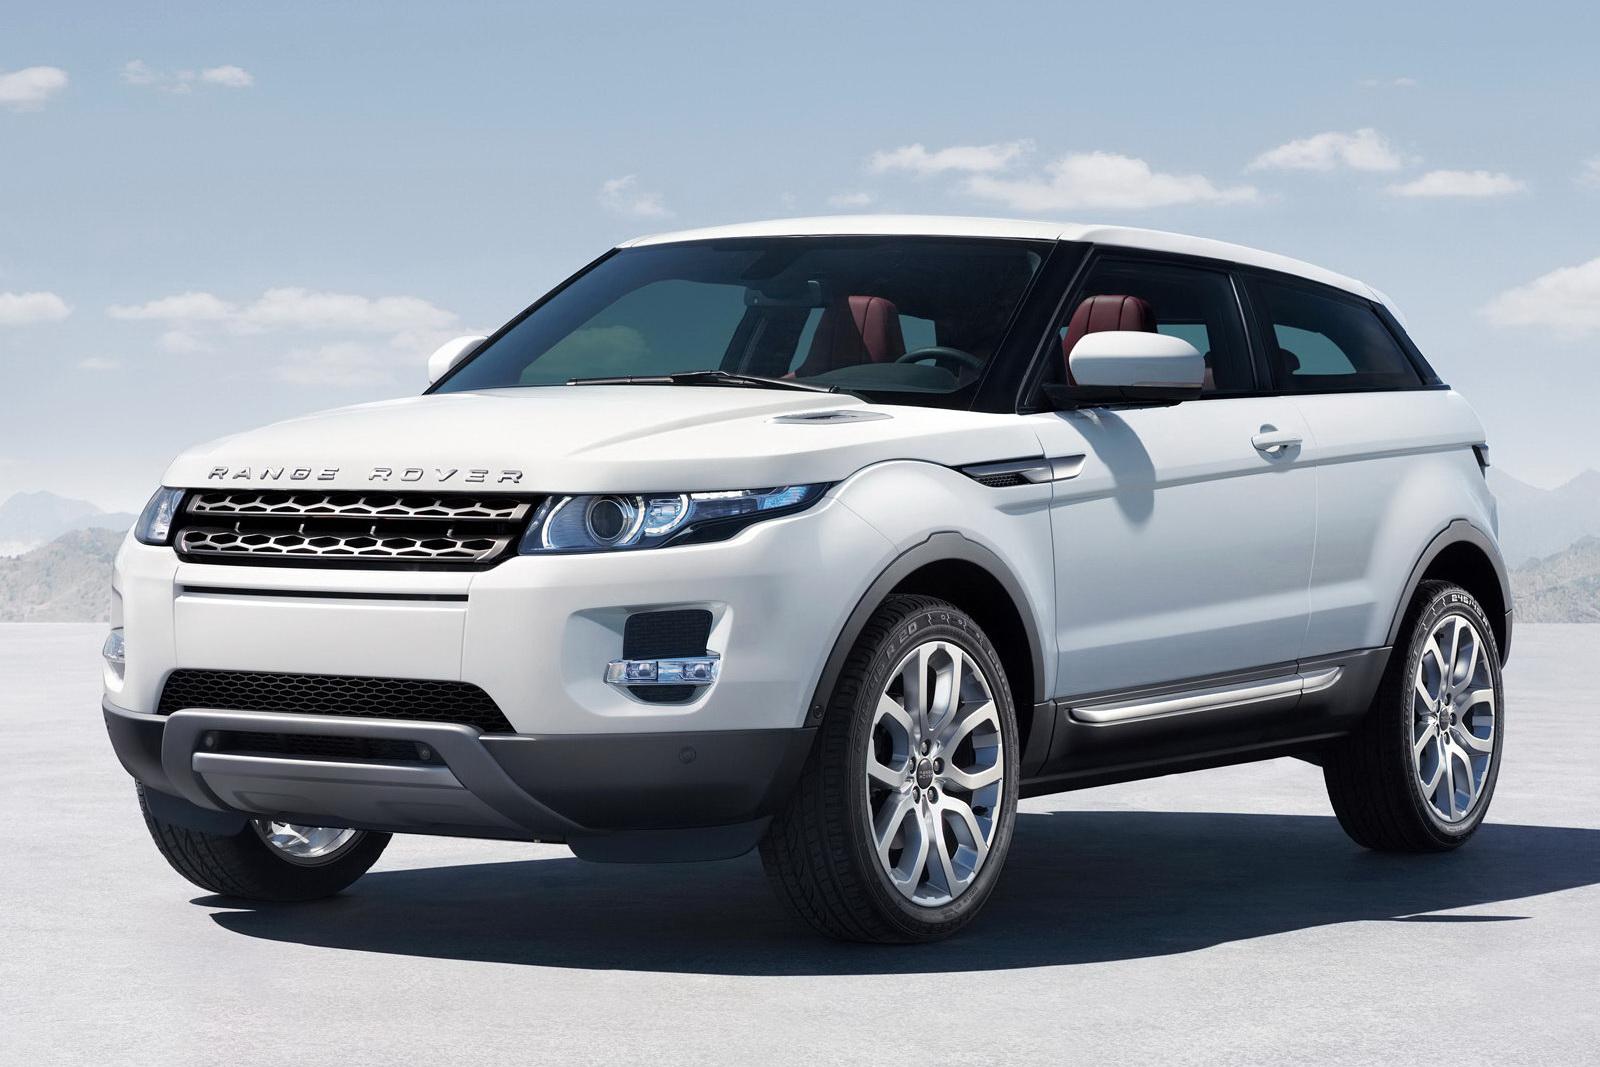 free range rover evoque pictures